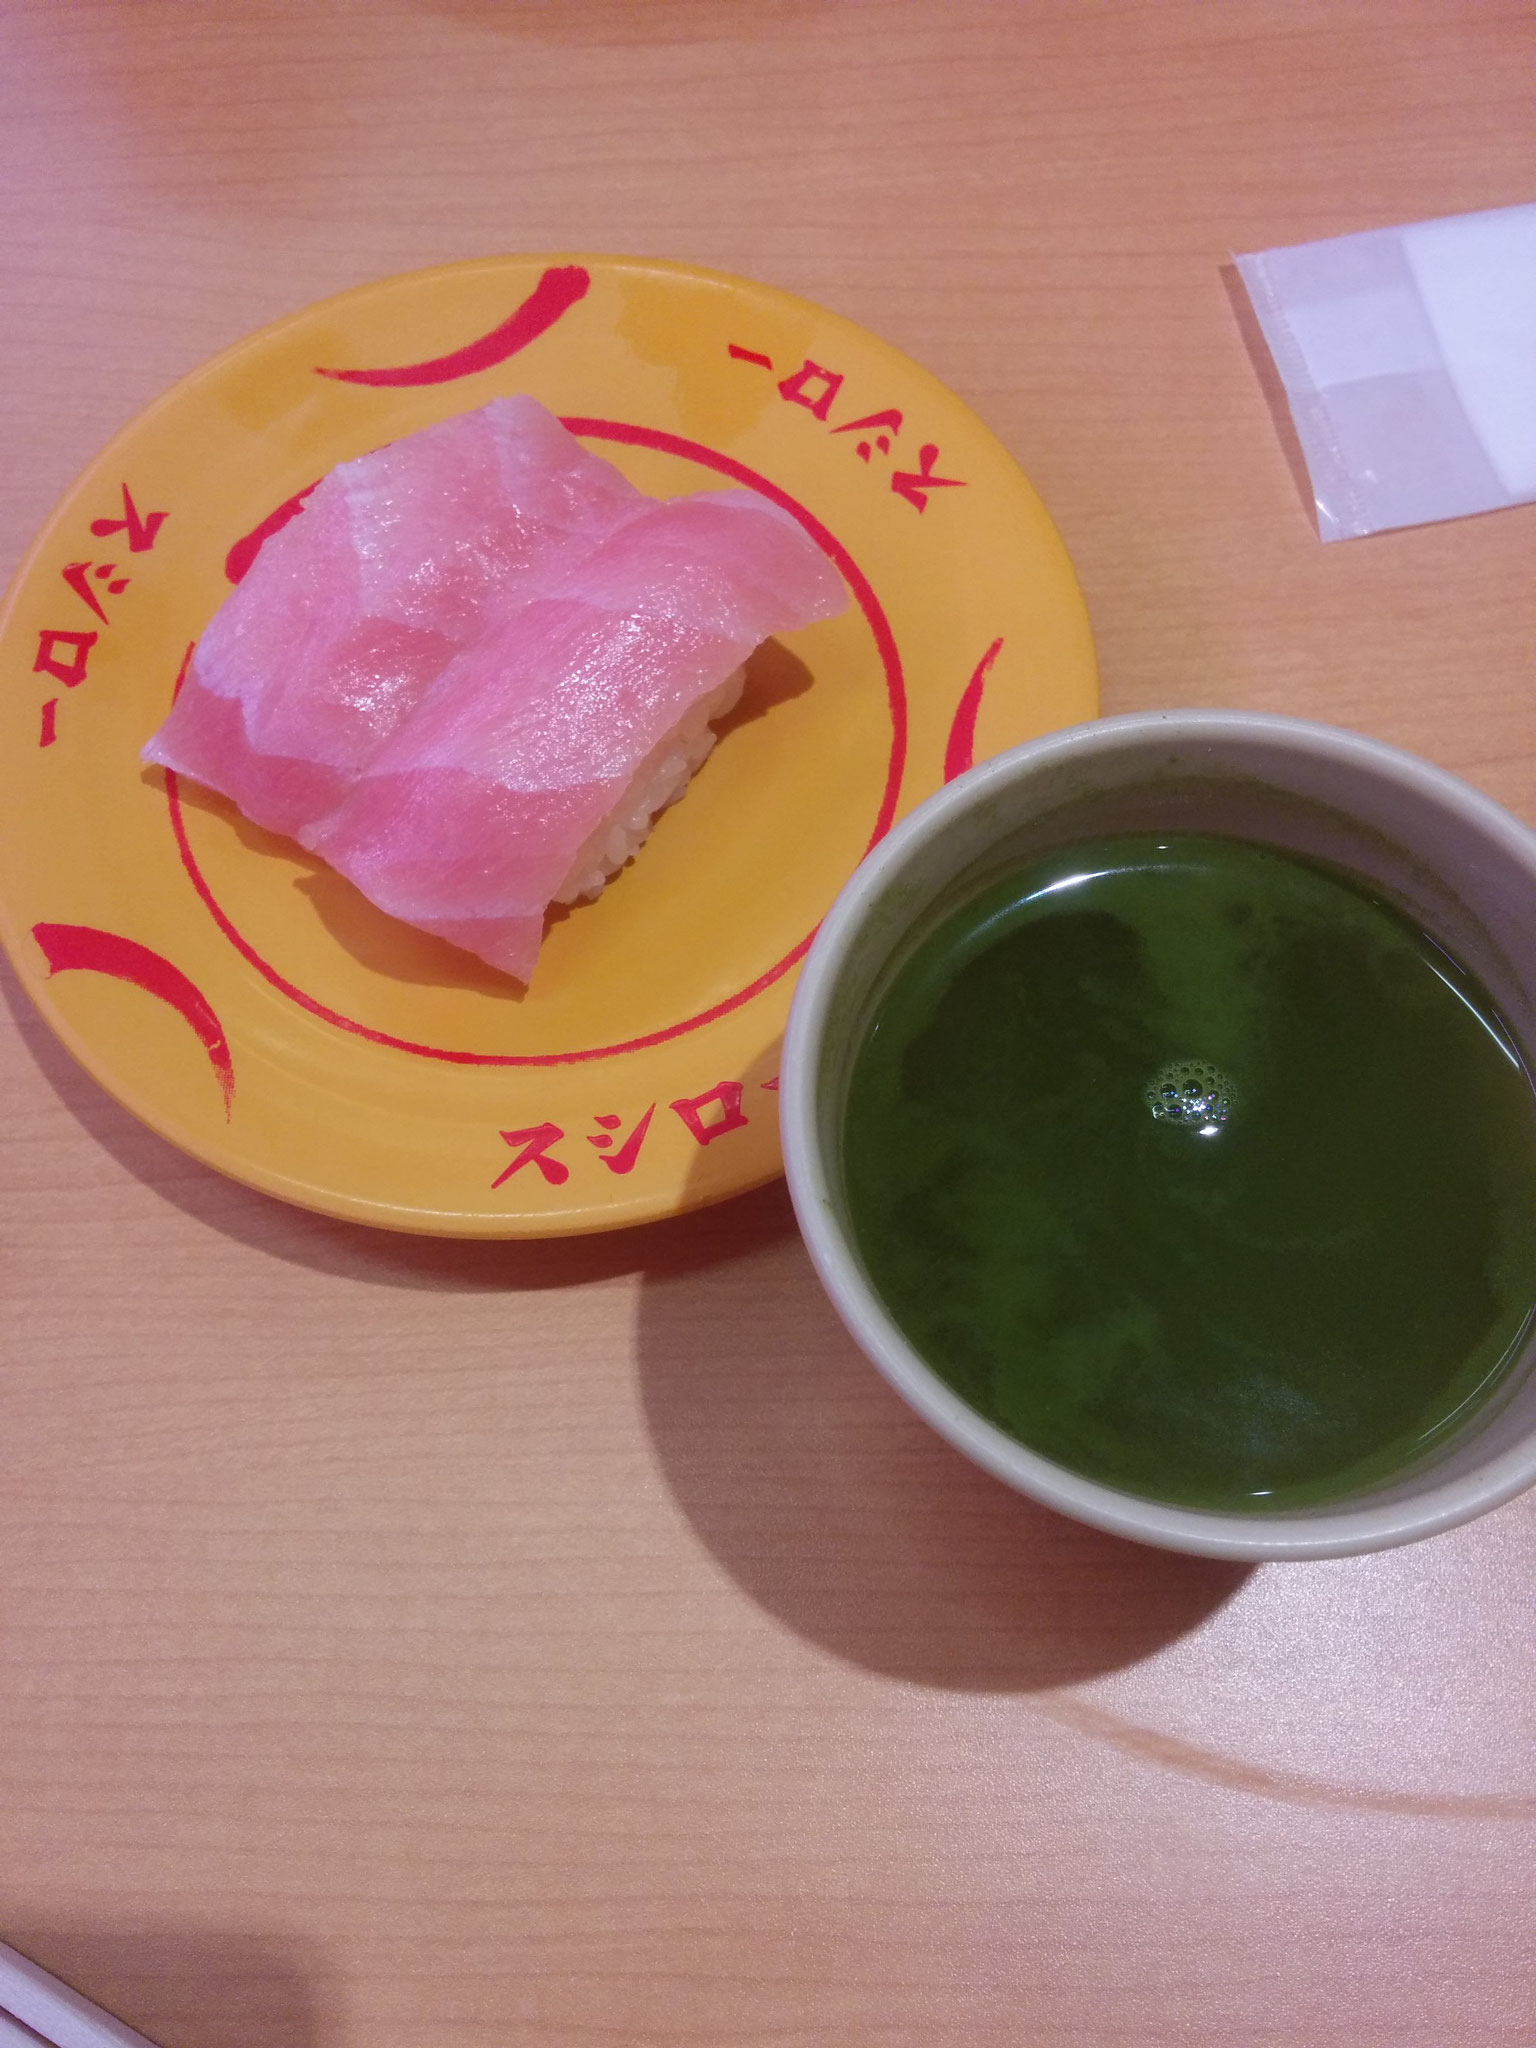 6 Sushi and Green Tea